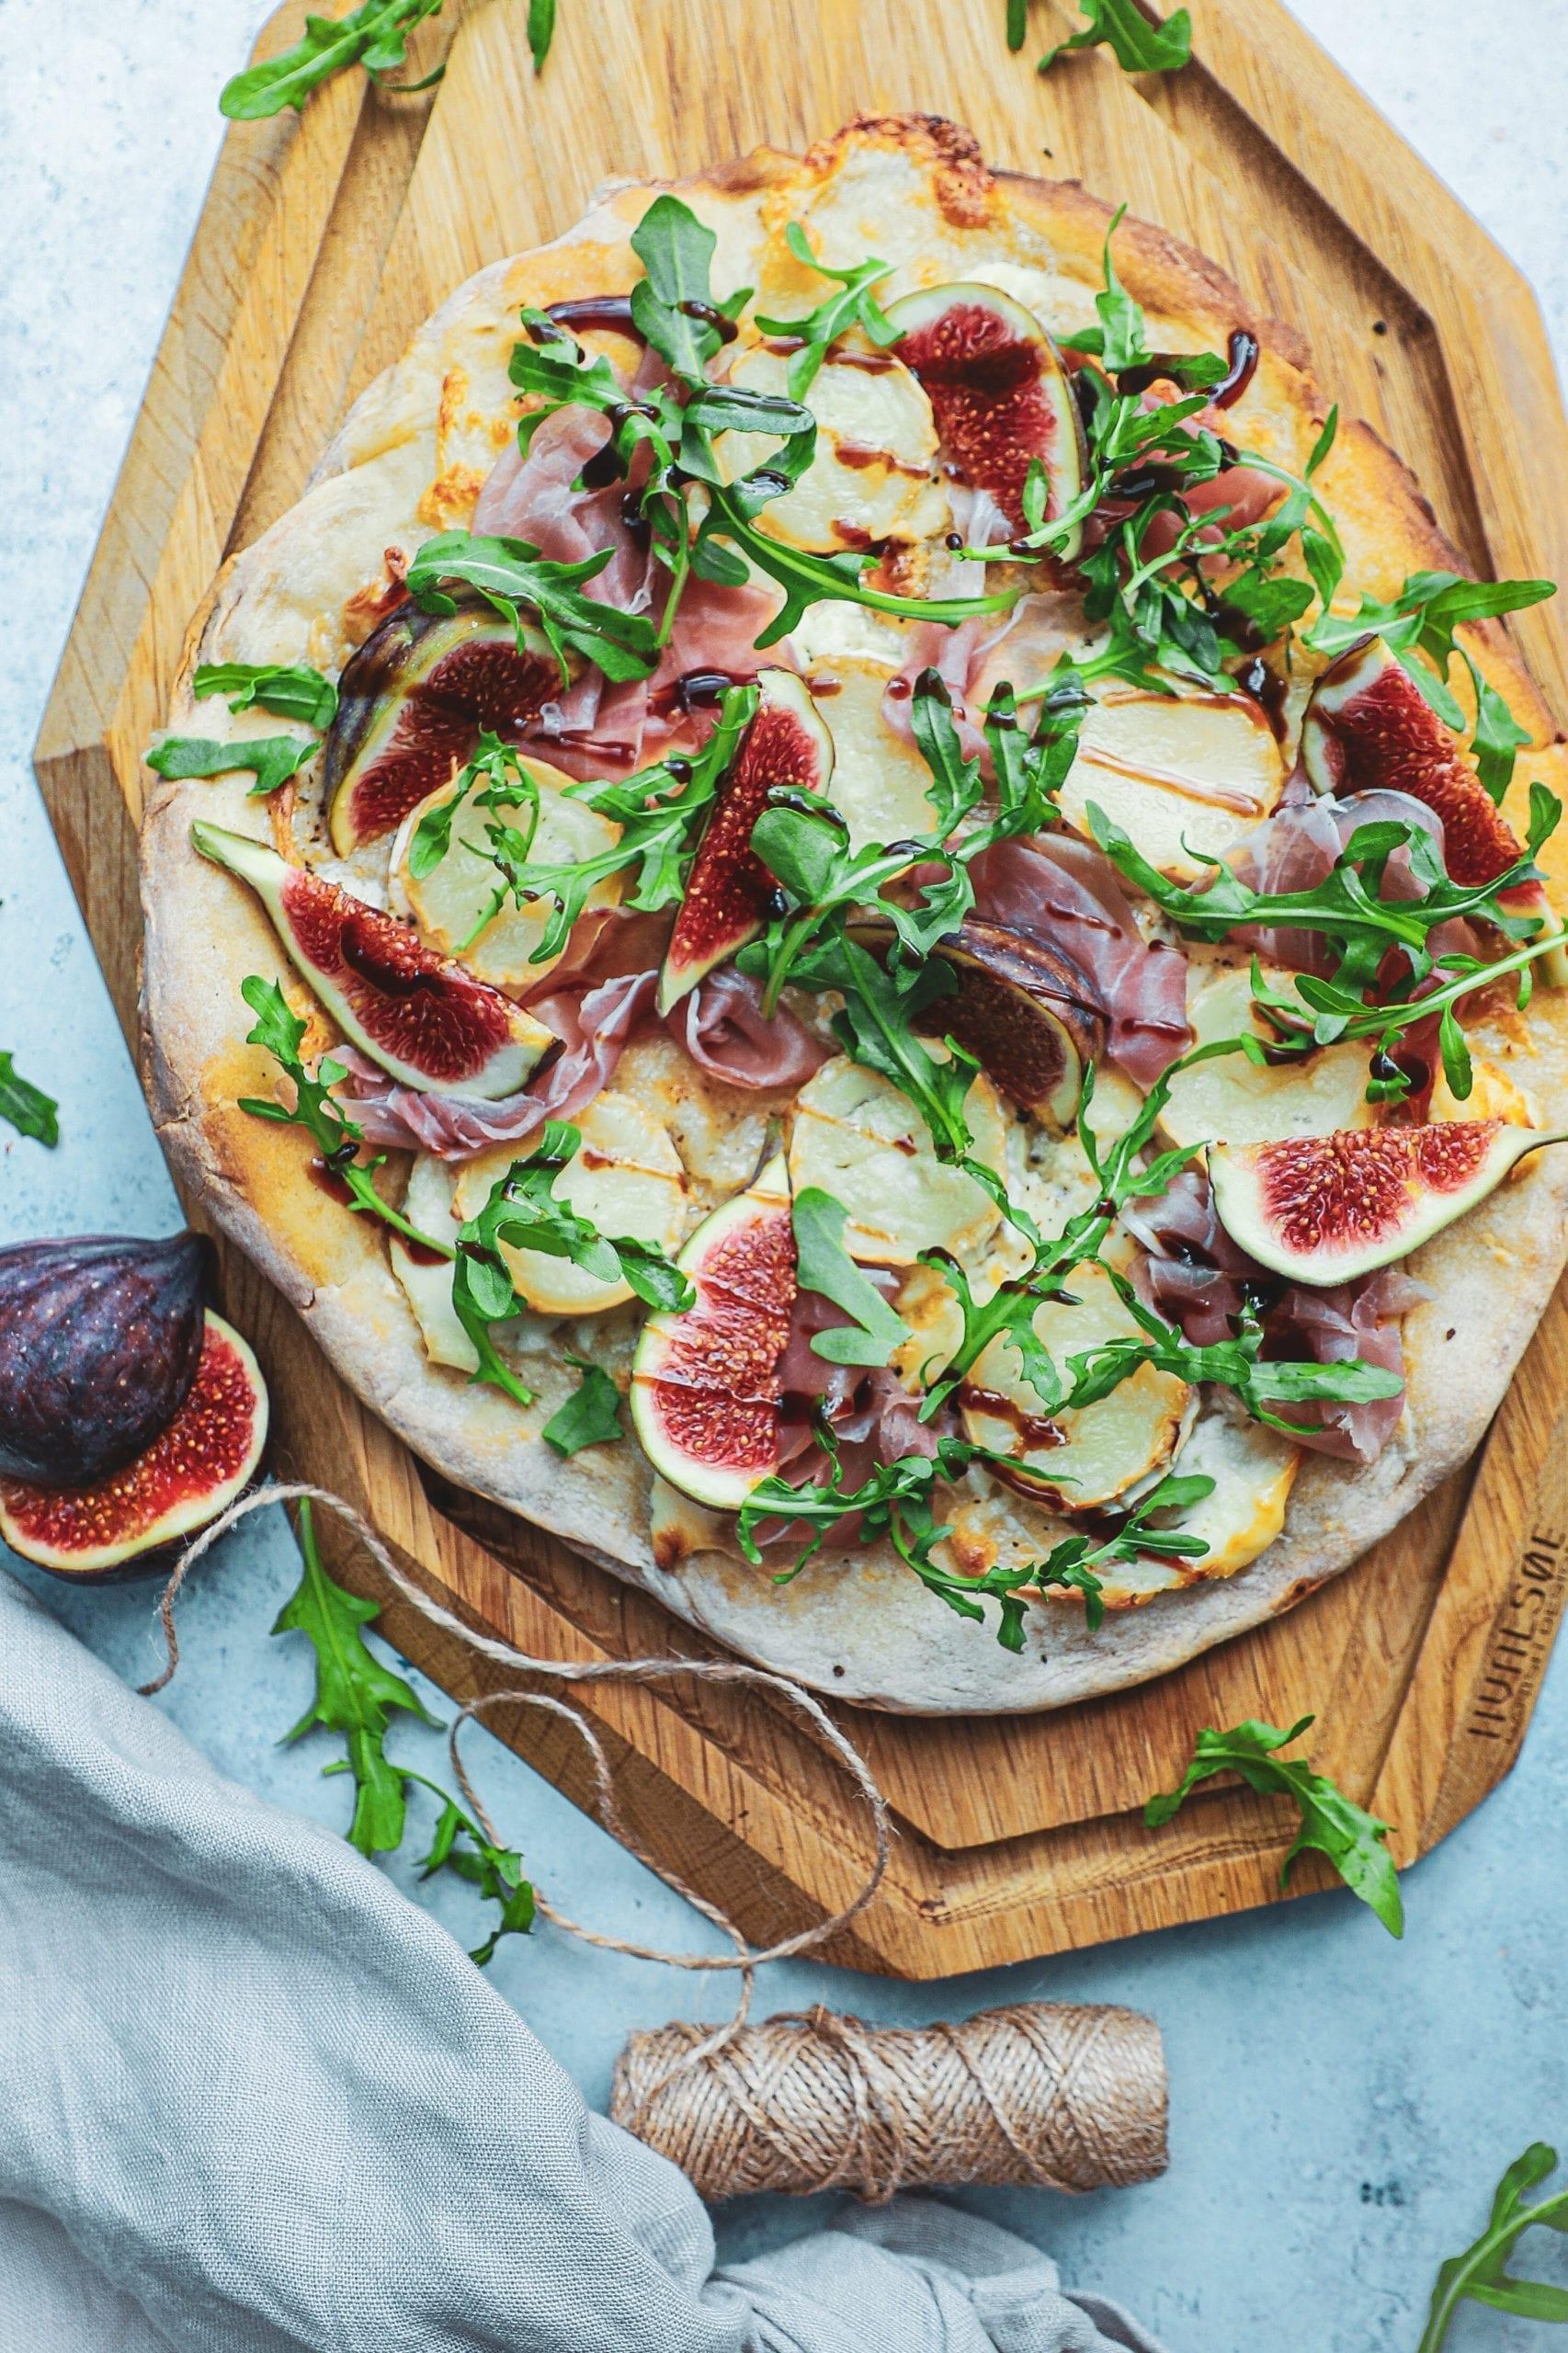 Pizza med serrano, gedeost og friske figner - Inspiration til topping